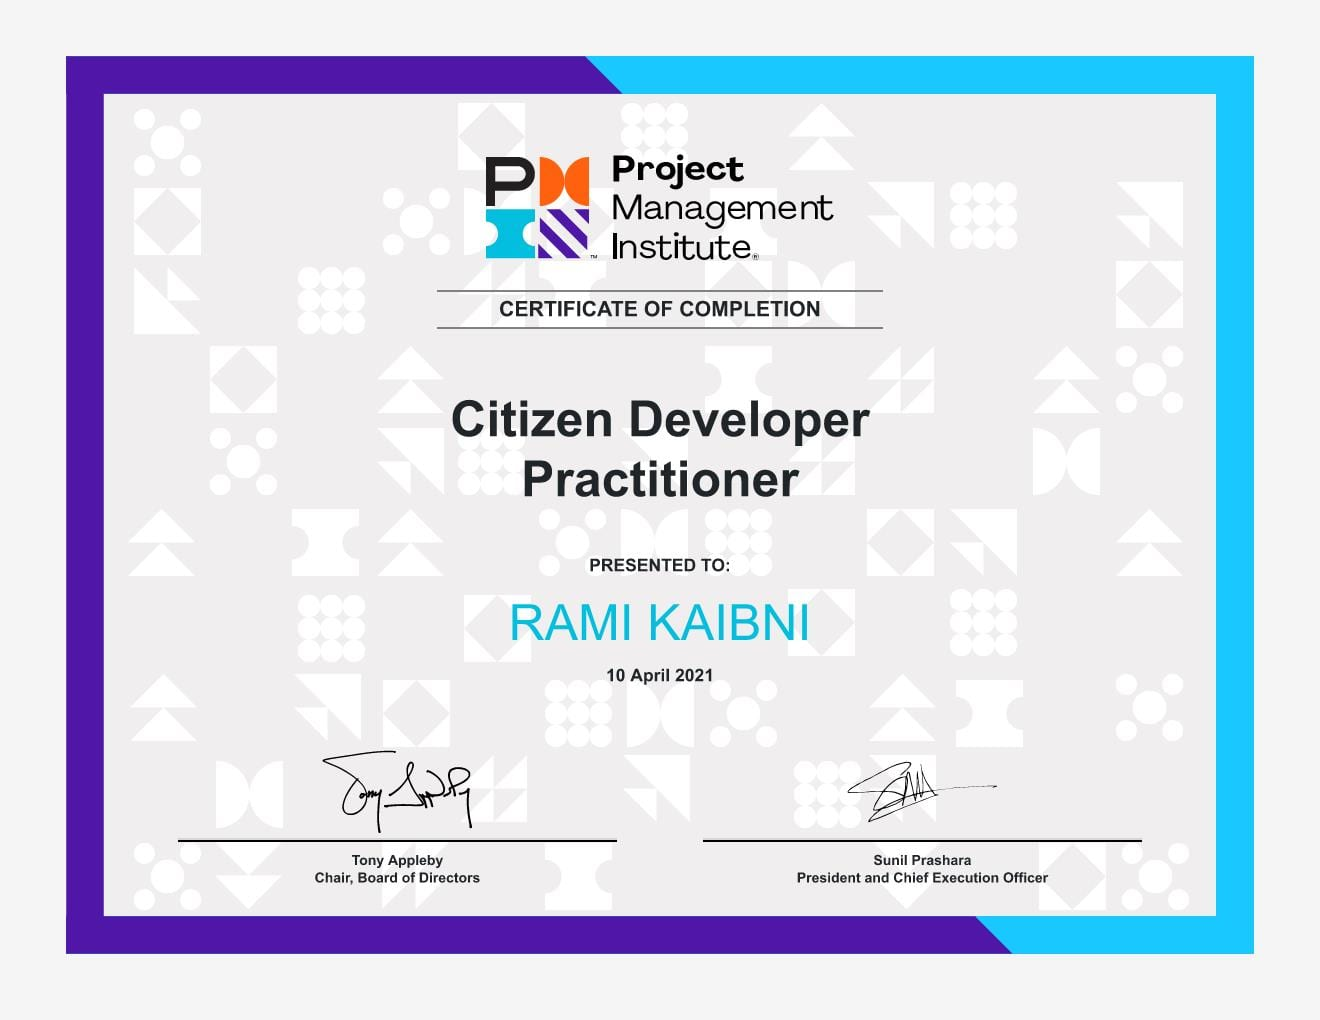 Citizen Developer Practitioner Certificate